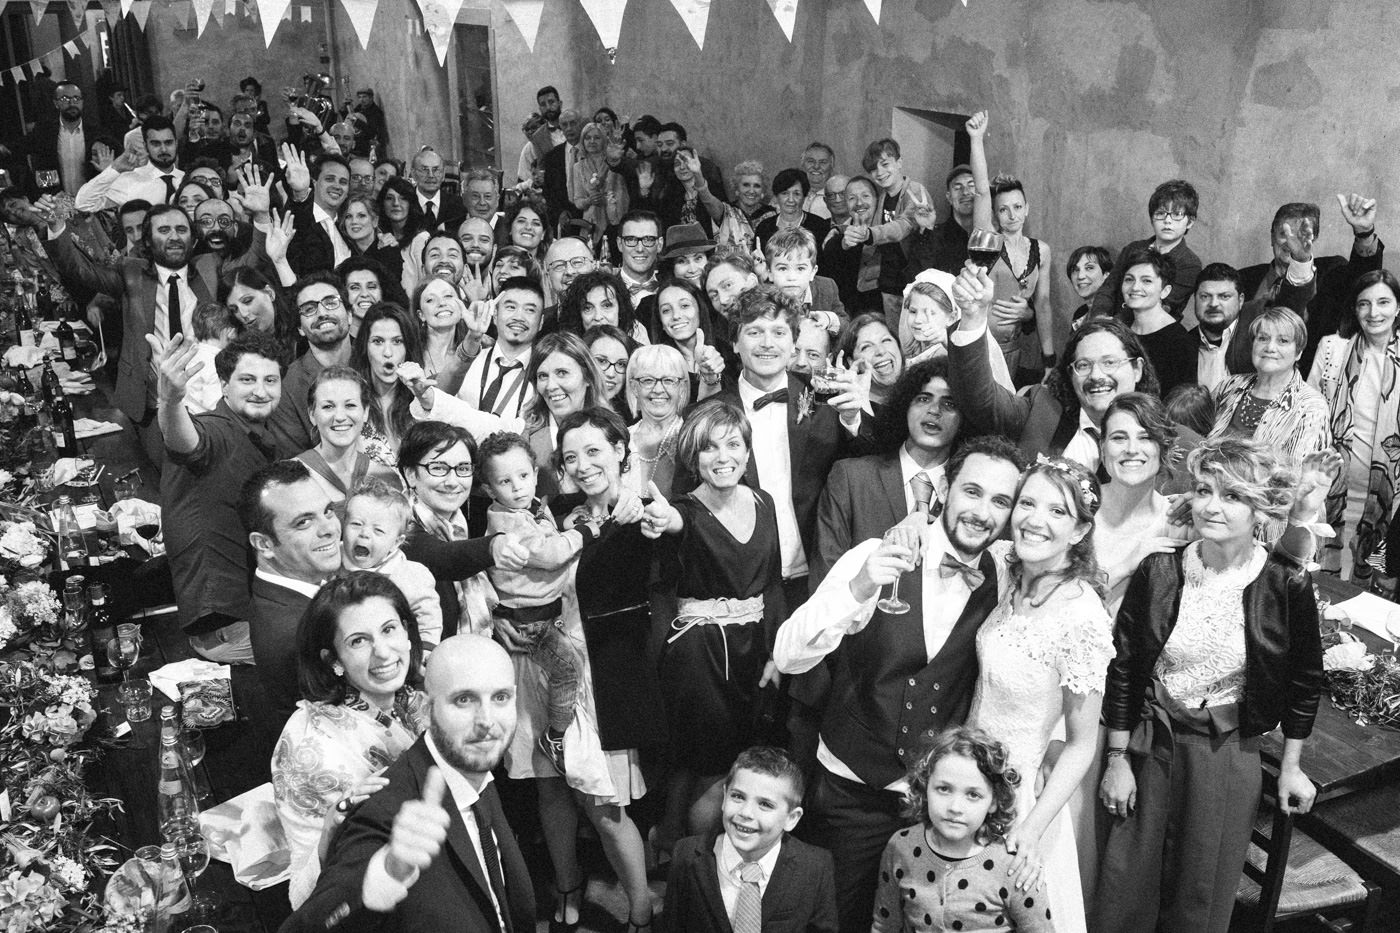 matrimoni_all_italiana_fotografo_matrimonio_toscana-63.jpg